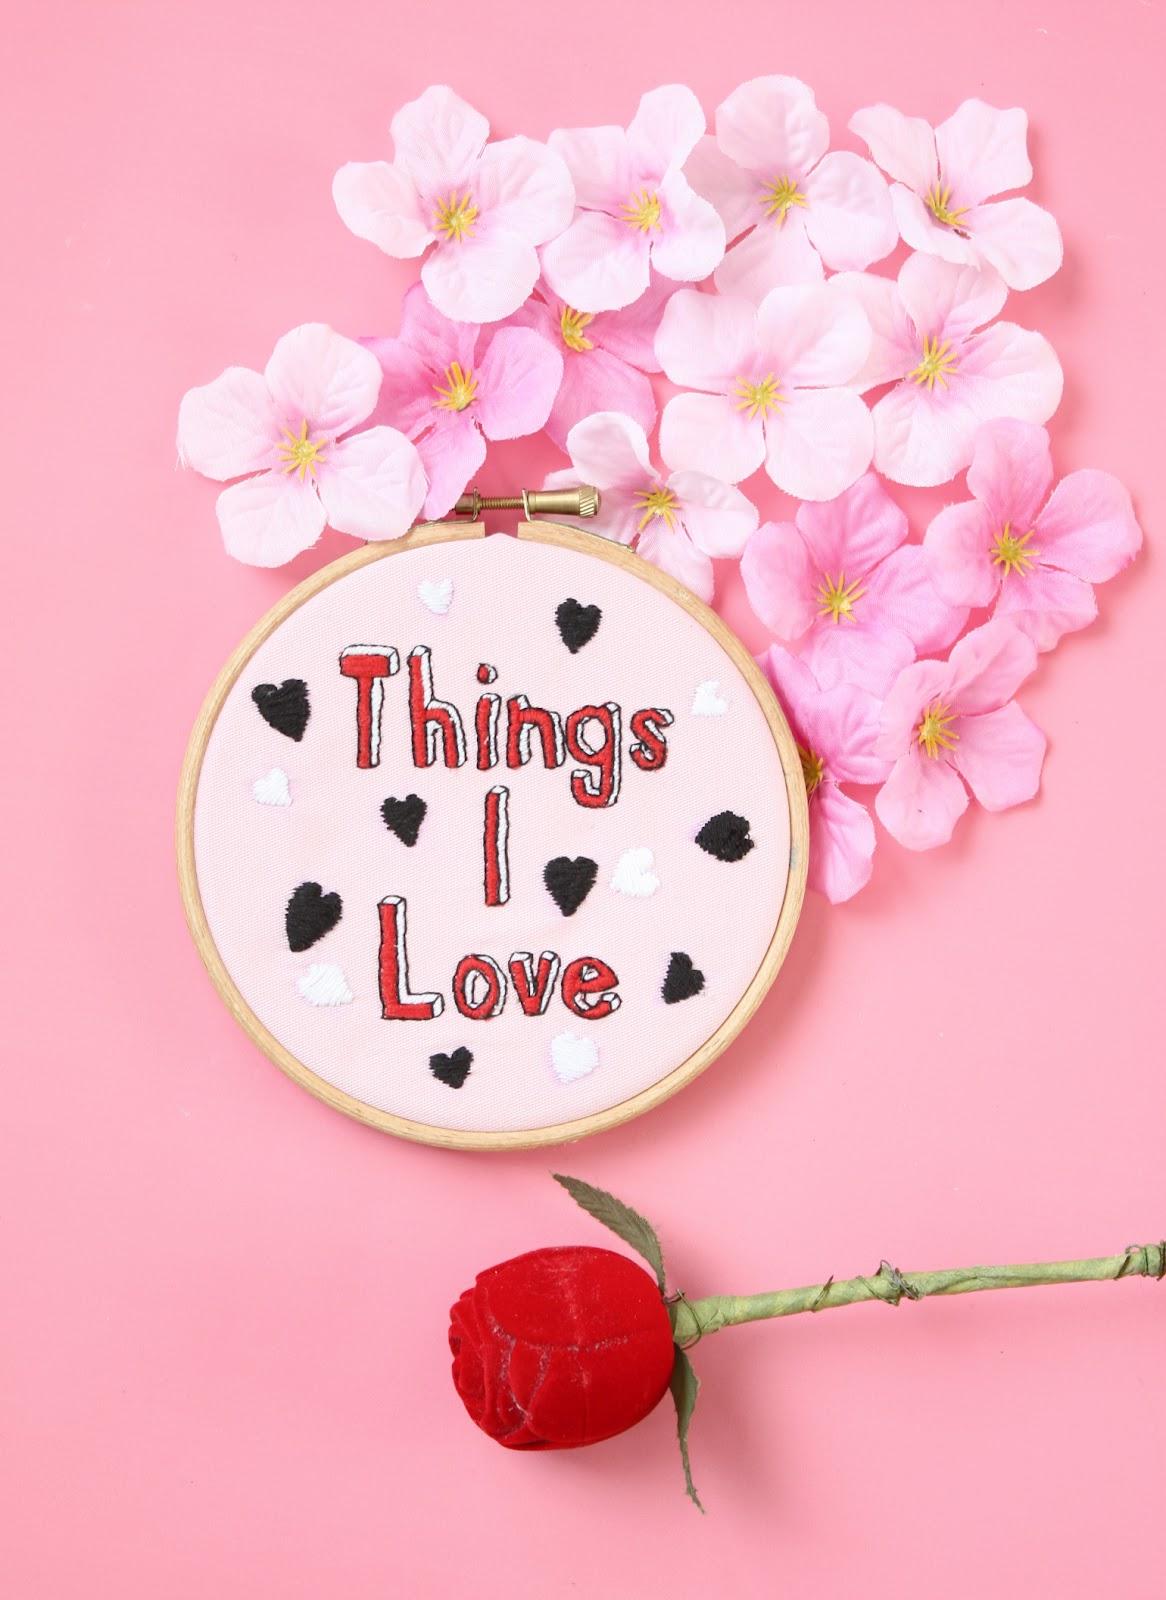 hand embroidery hoop art